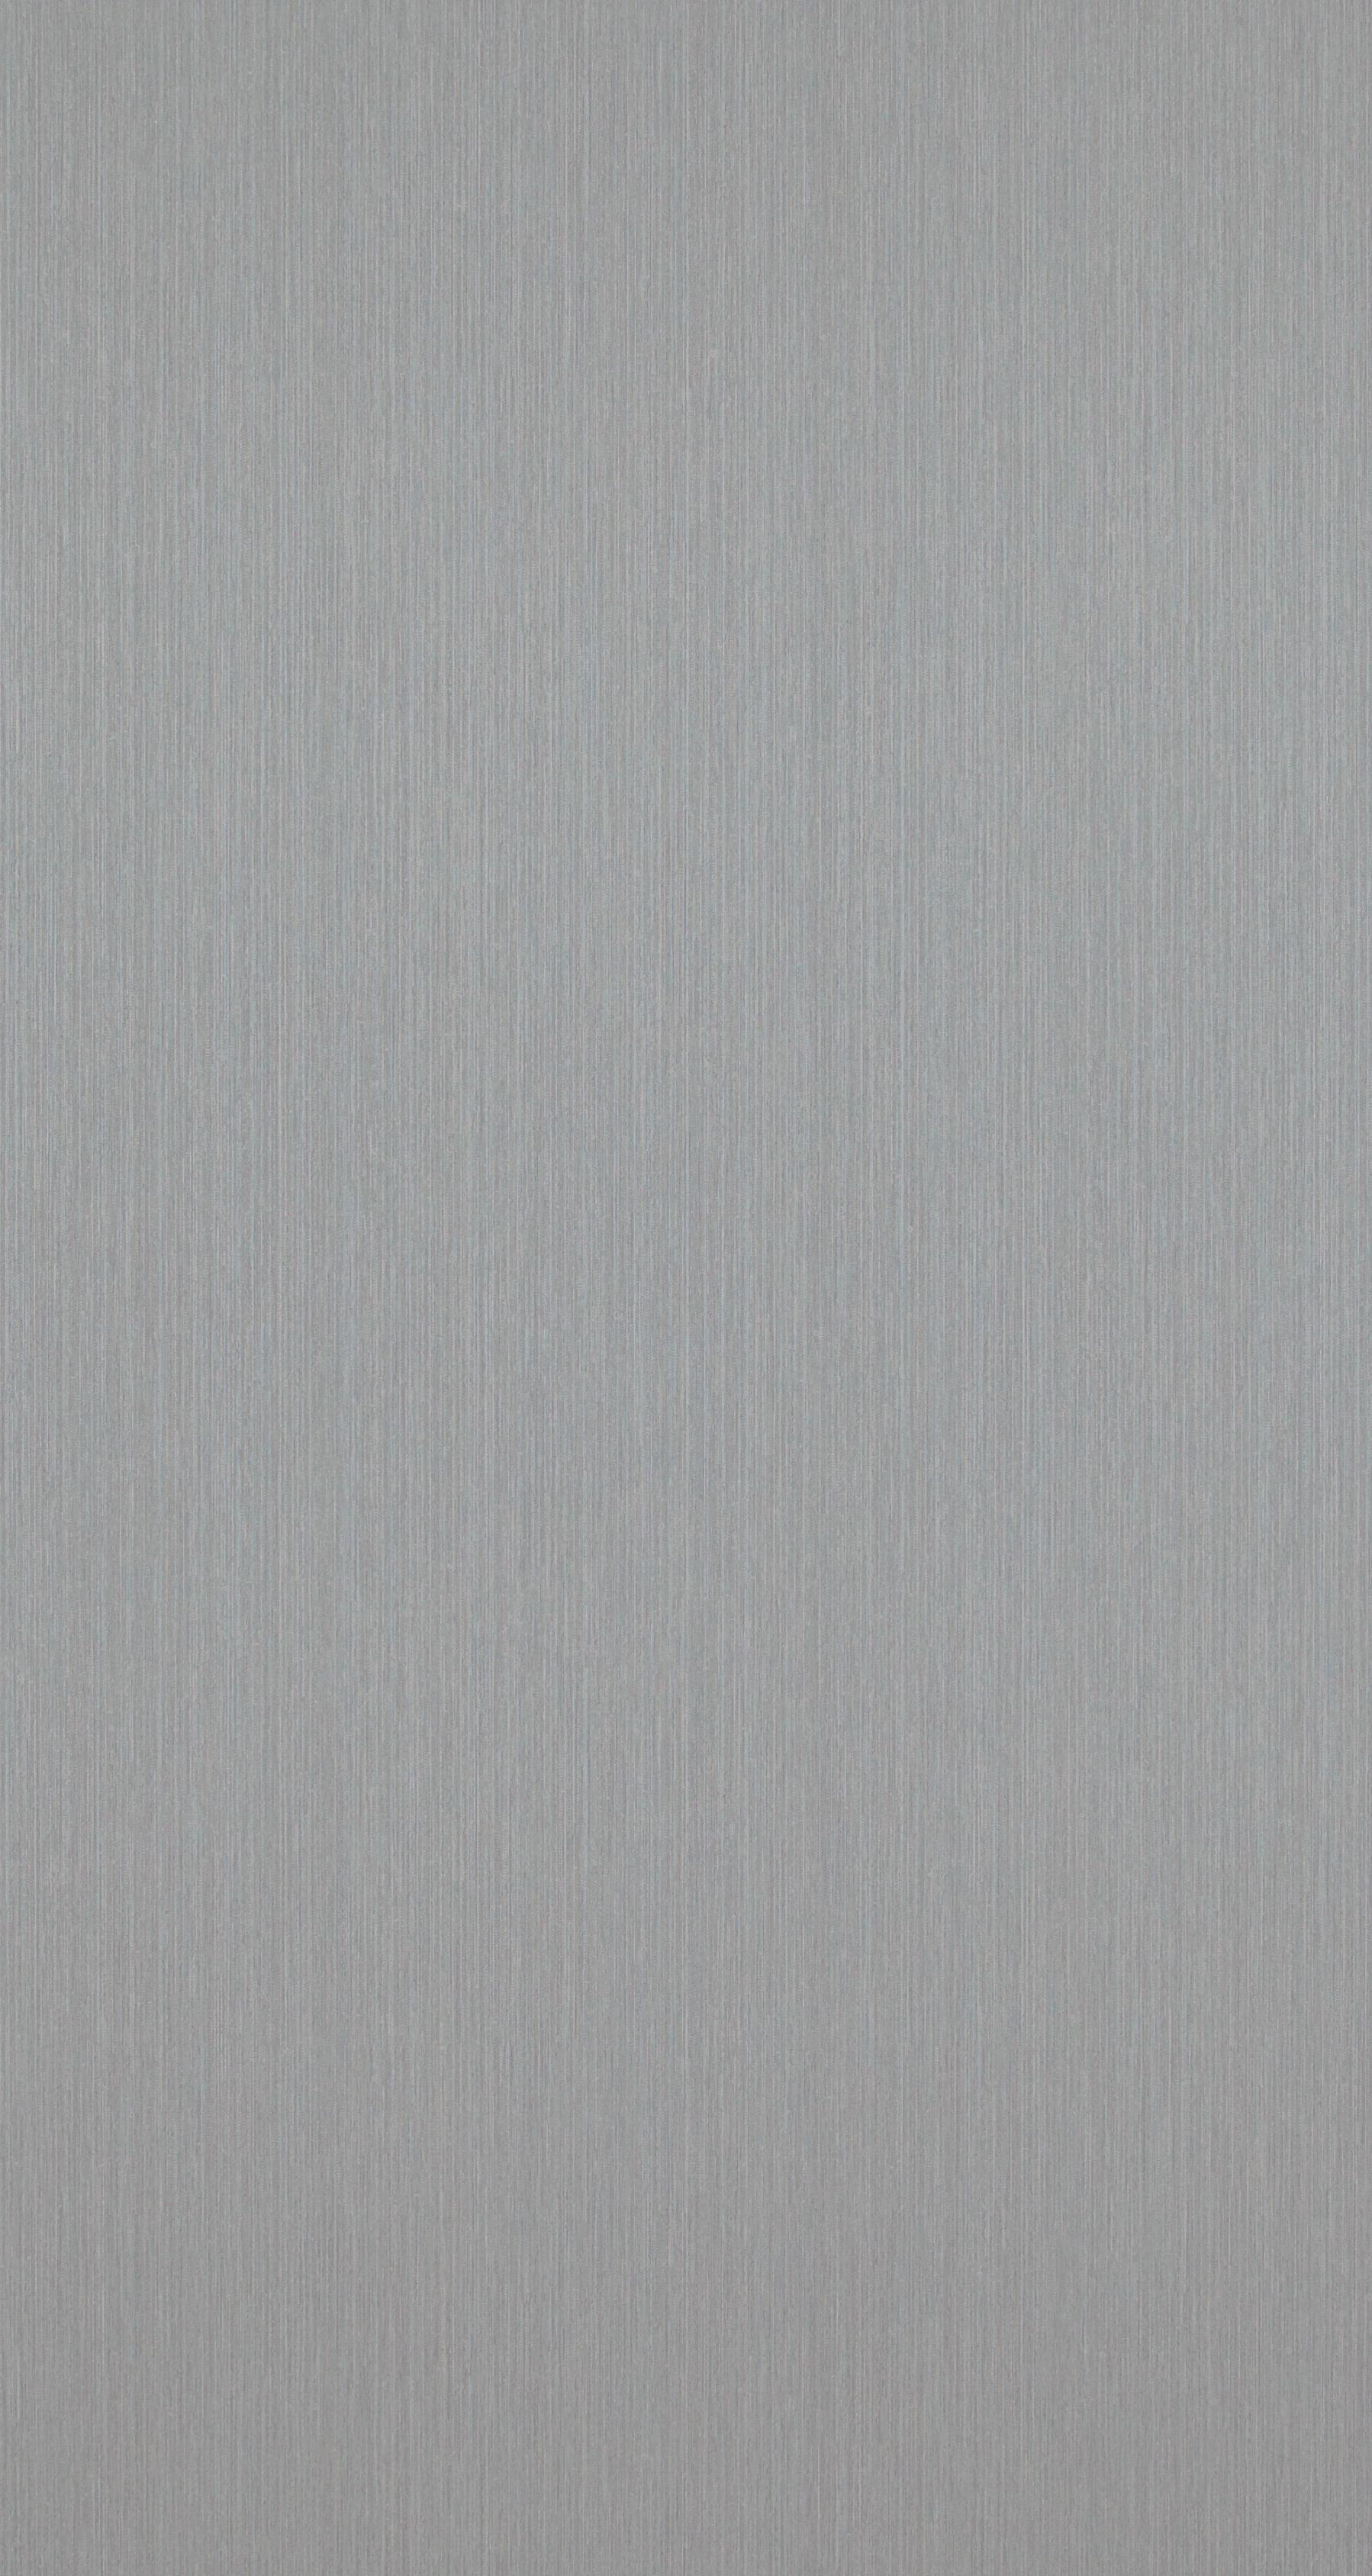 Обои  BN International,  коллекция Boutique, артикул17720